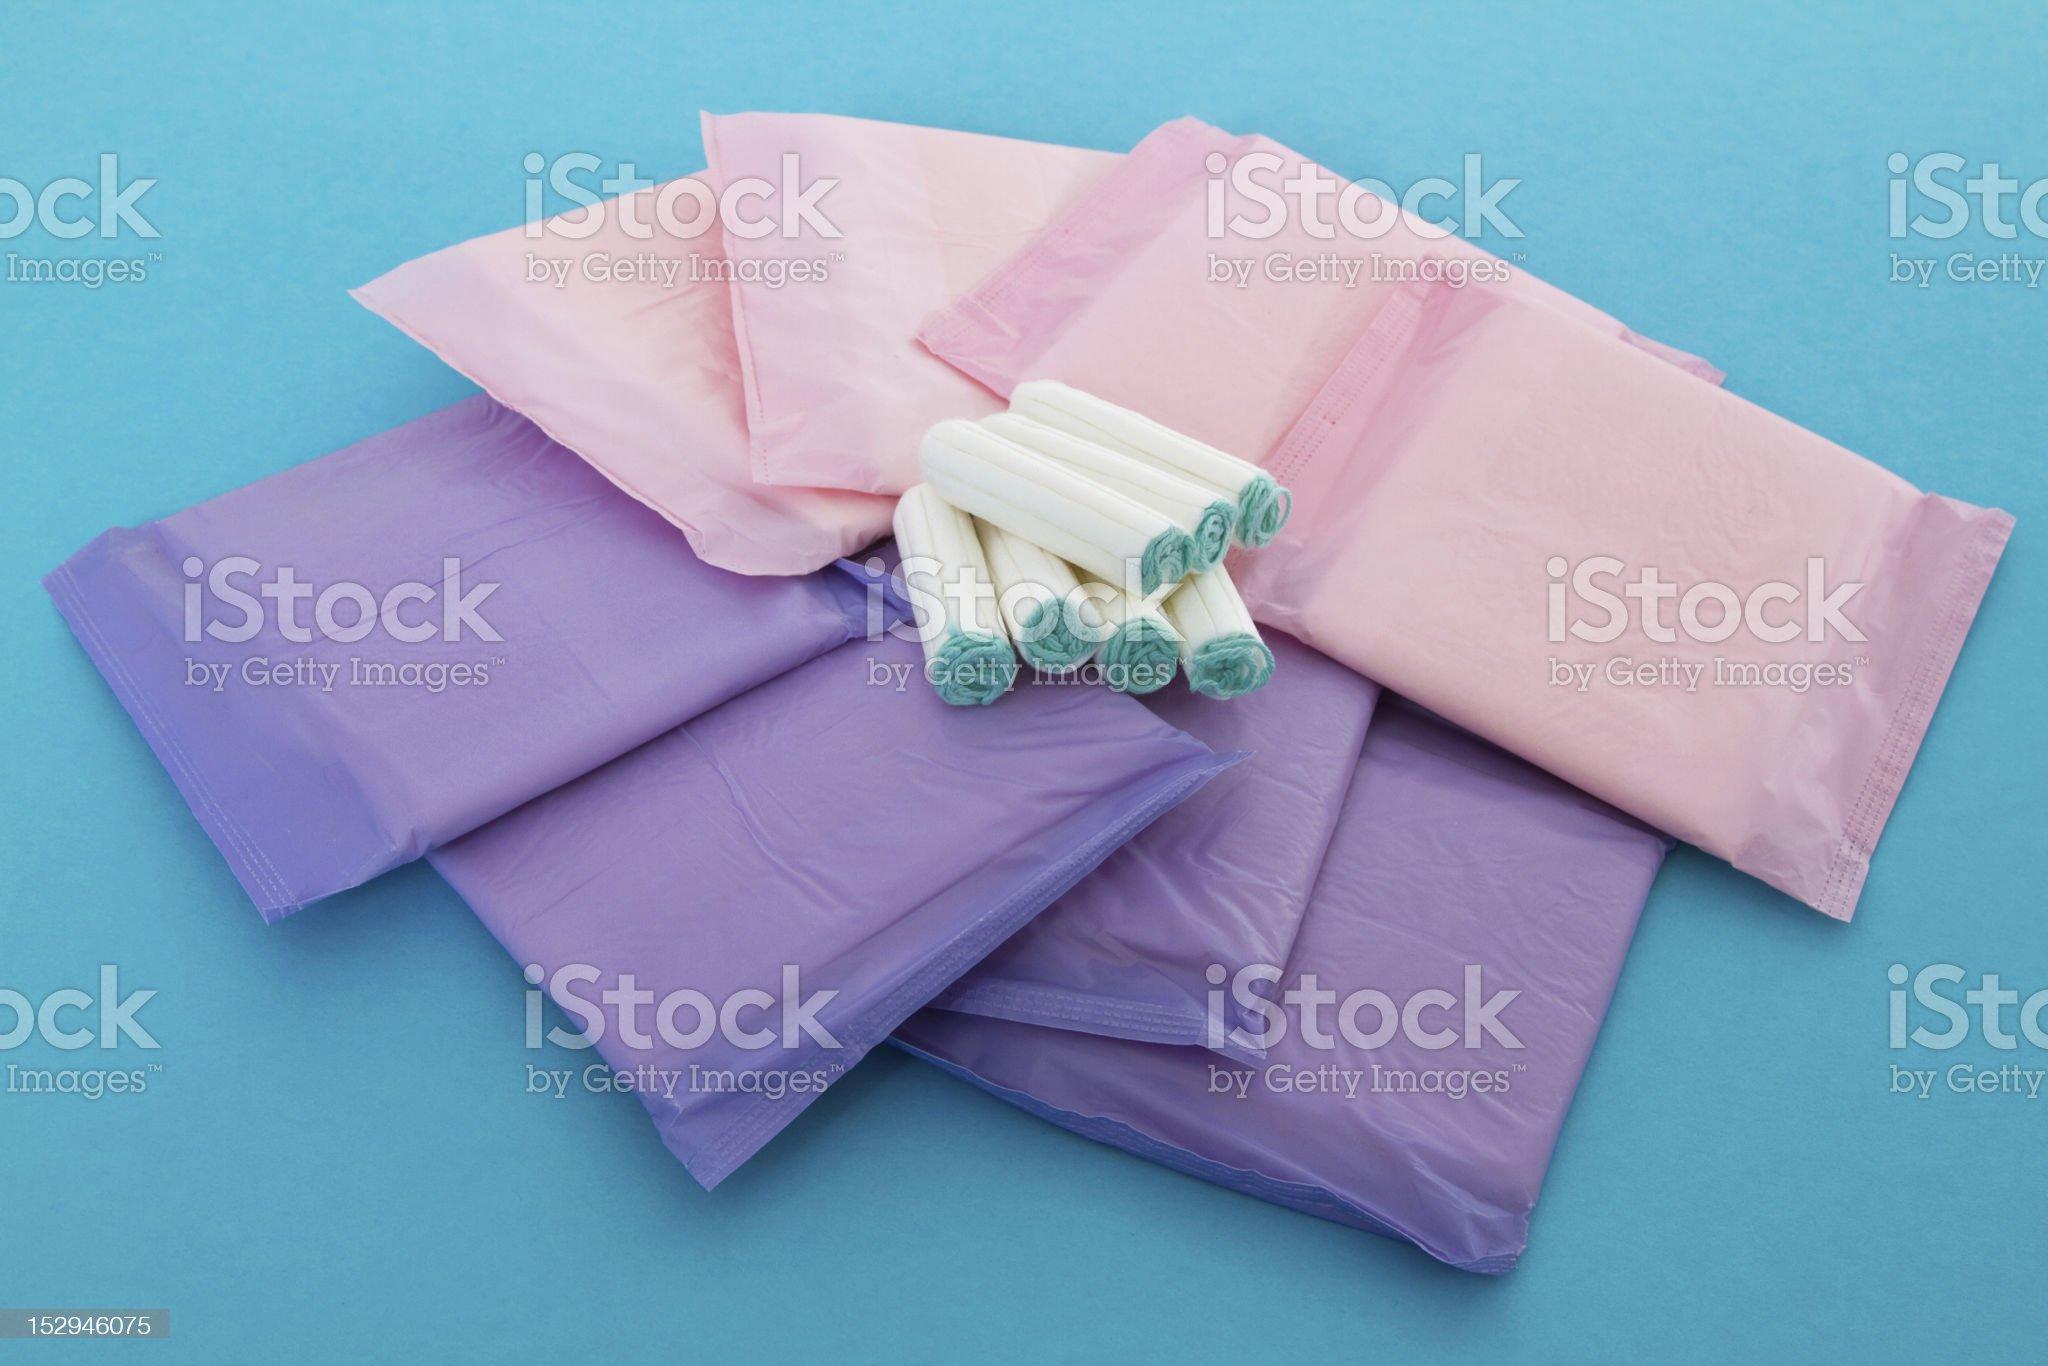 Sanitary napkins and tampons royalty-free stock photo